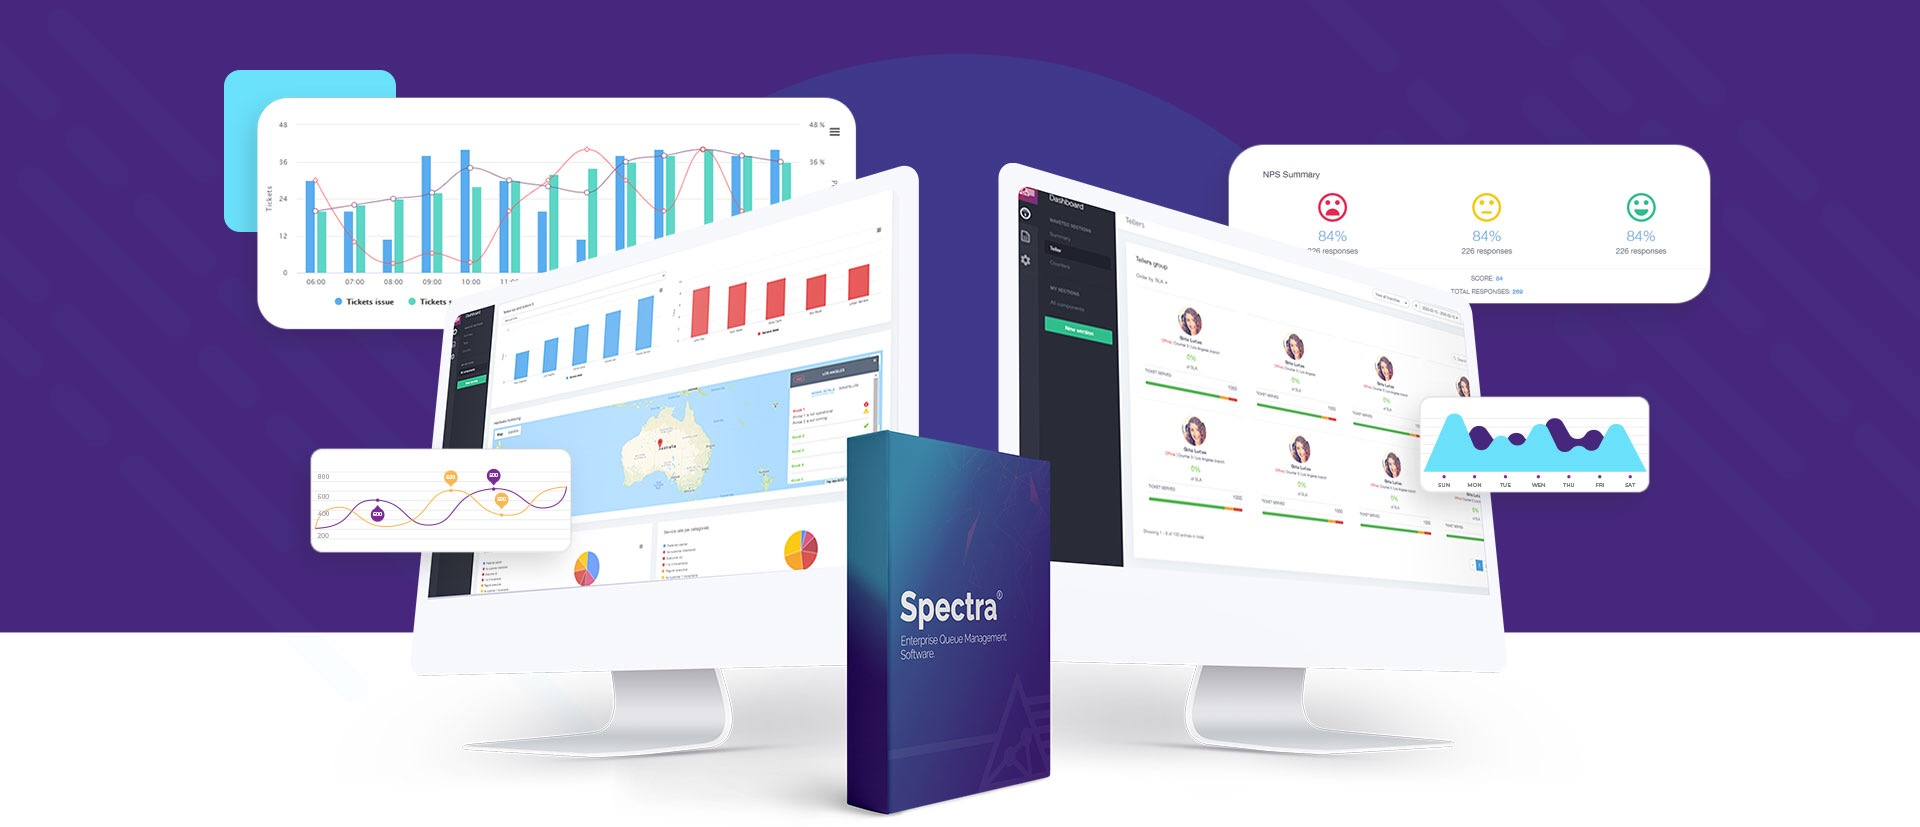 Complete Spectra solutions range